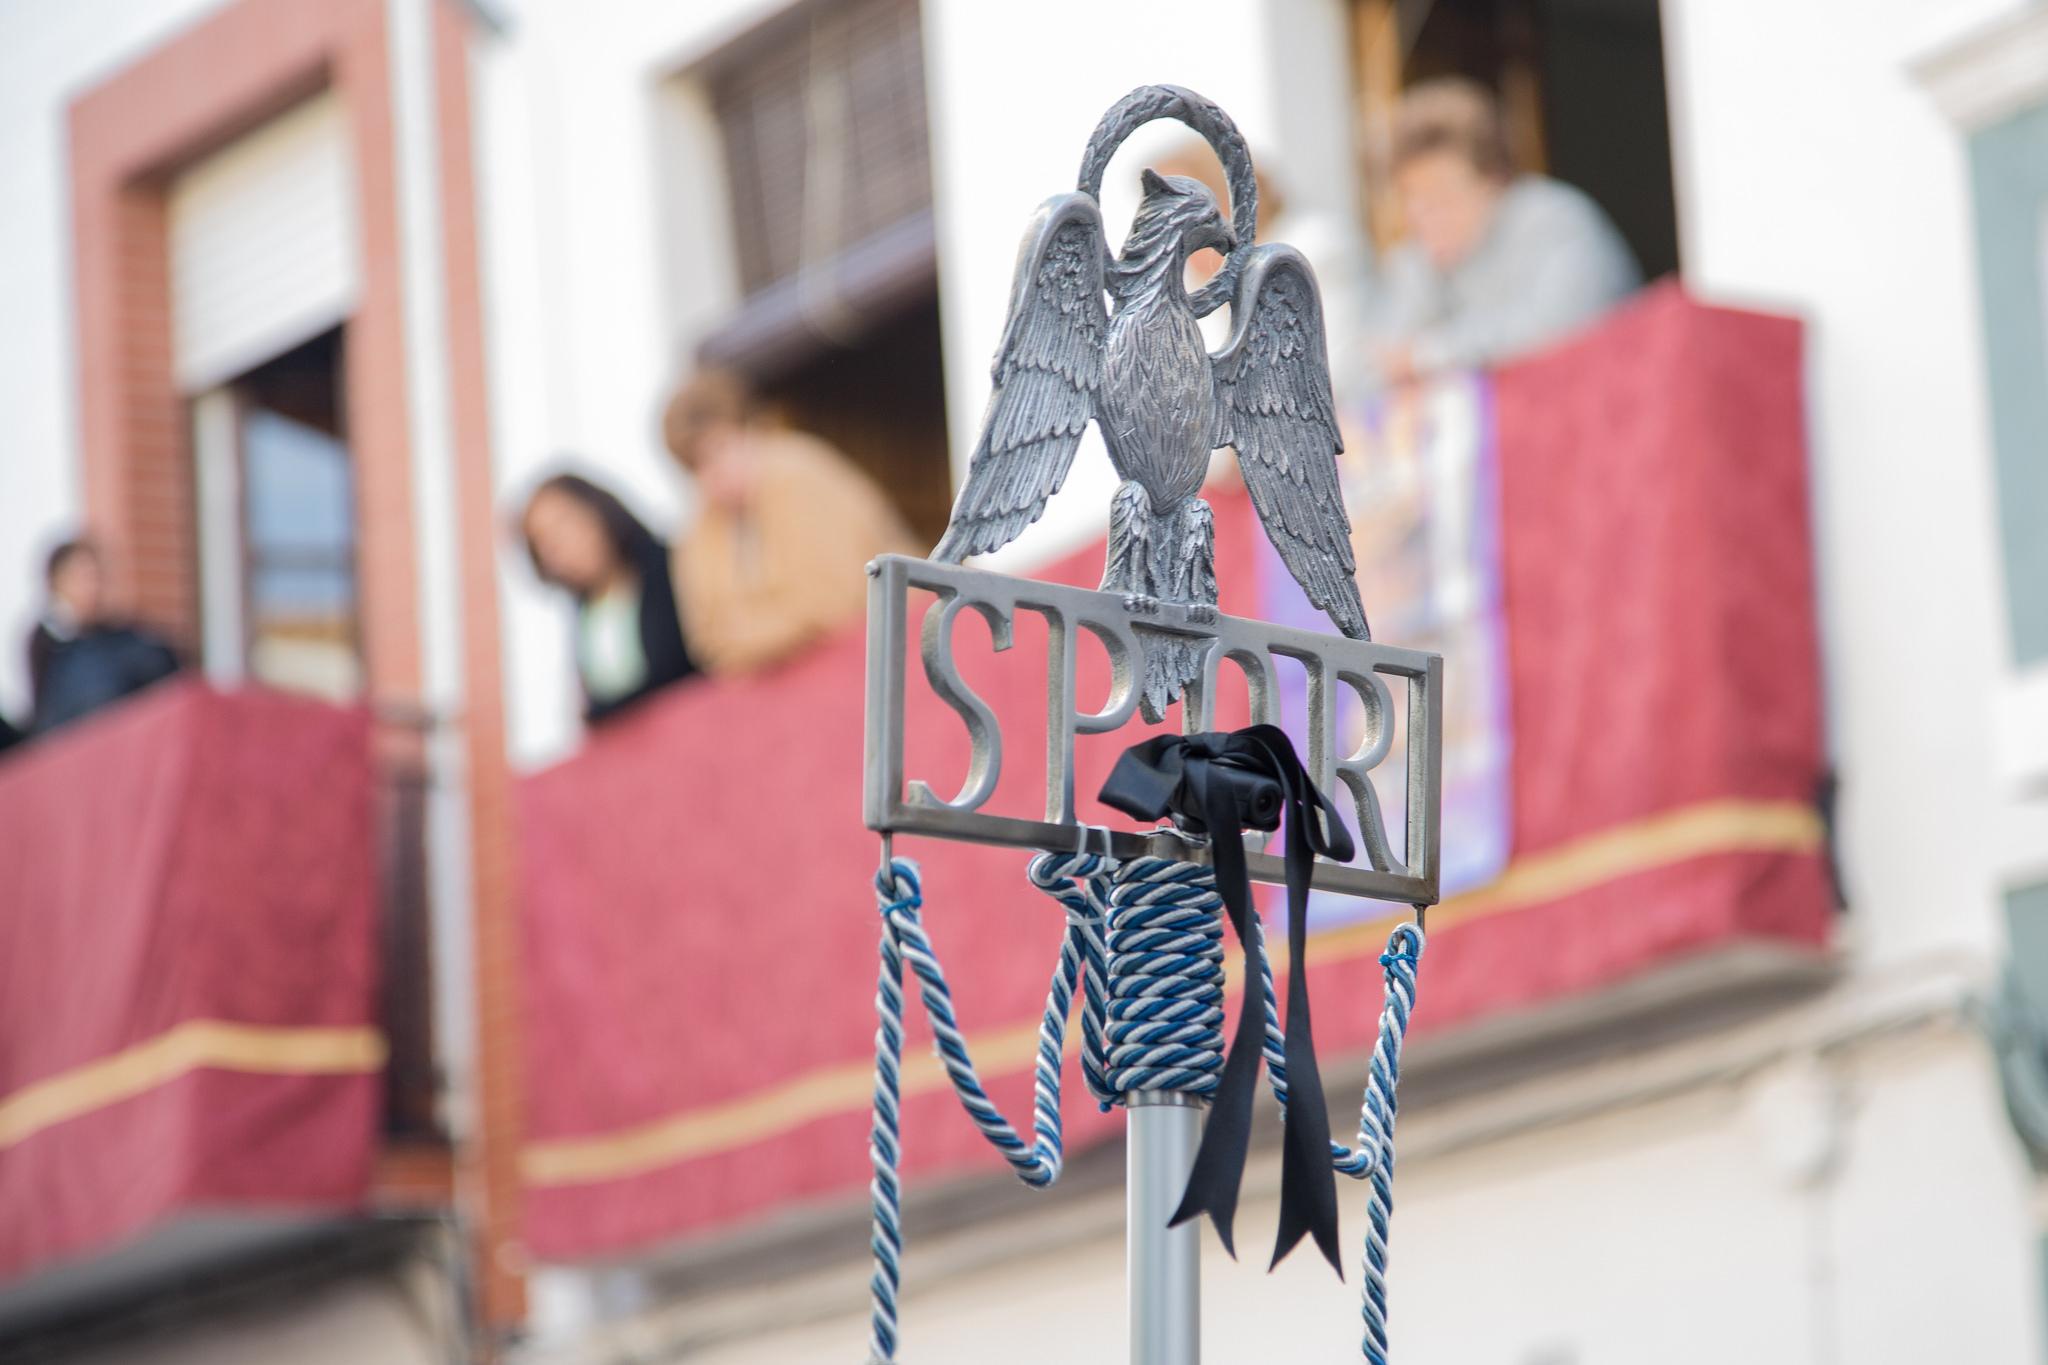 Semana santa de puente genil 2015 alex m rquez photo for Muebles marquez puente genil